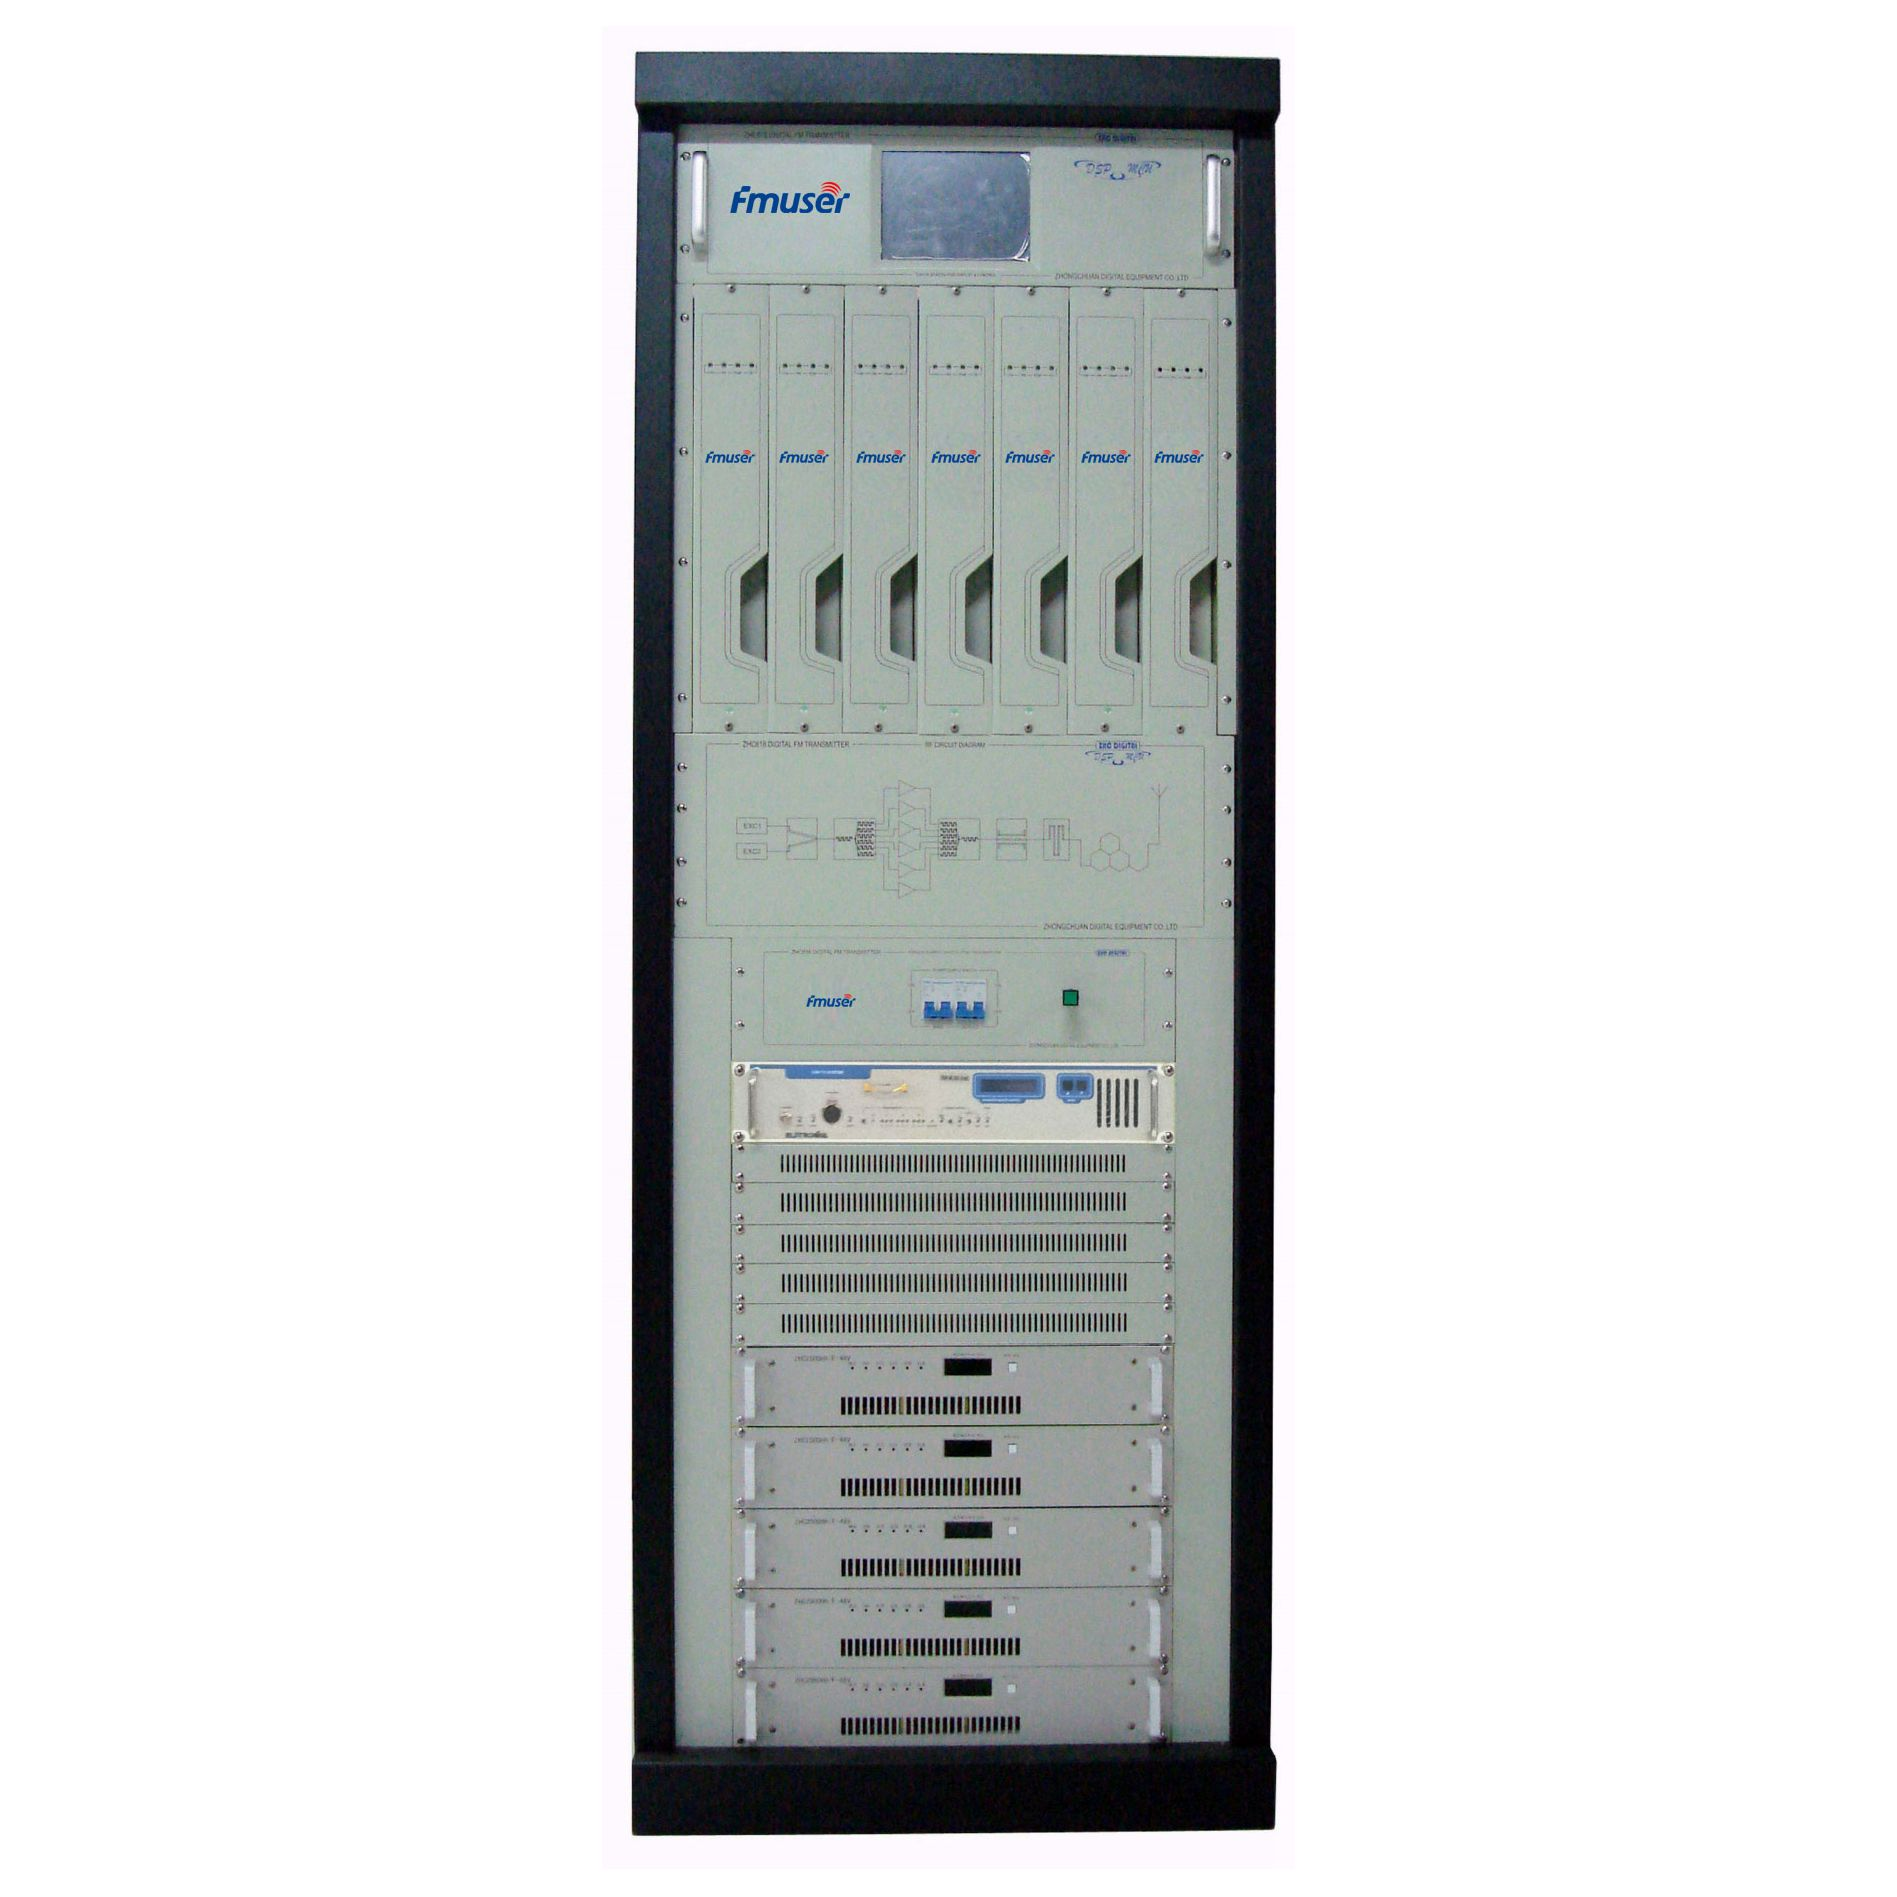 FMUSER CZH518A-5KW 5KW 5000w 아날로그 텔레비젼 전송기 텔레비젼 방송국을위한 직업적인 VHF / UHF 아날로그 텔레비젼 전송기